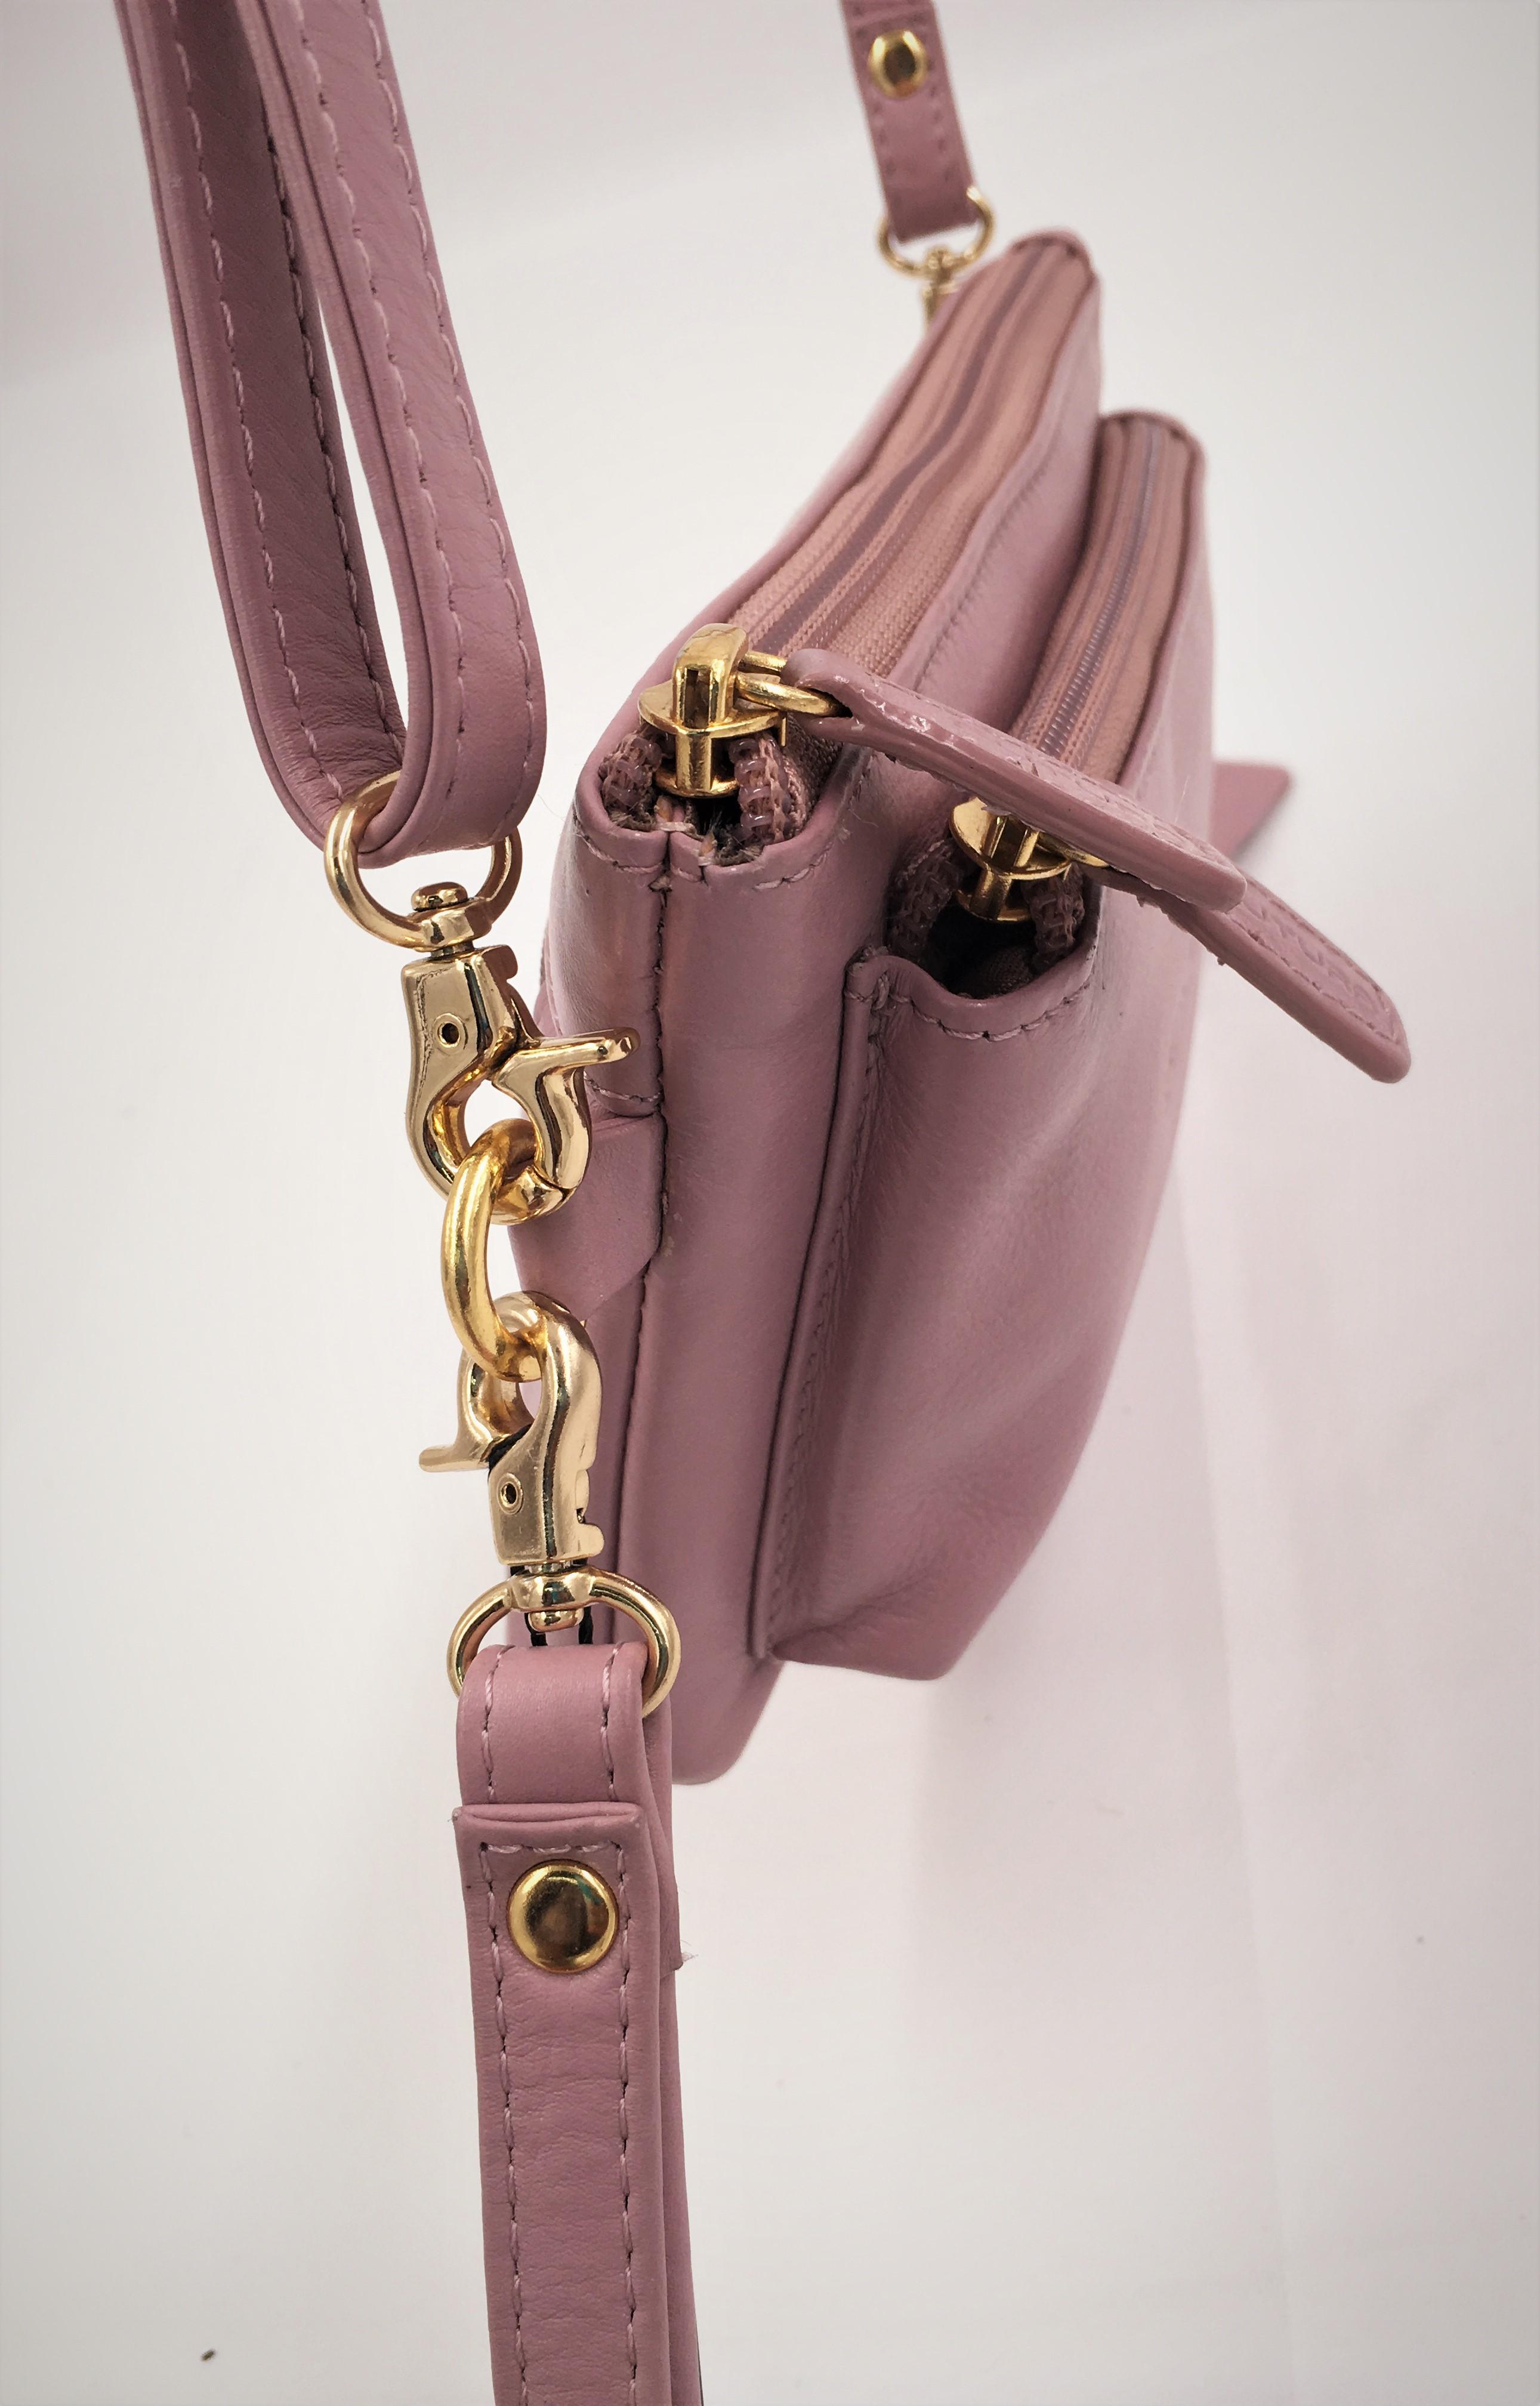 Reasonable Strap You Brand Real Leather Fabric Gold Buckle Ladies Shoulder Belt Crossbody Handbags Parts Bag Accessories Metal Bao Handles Luggage & Bags